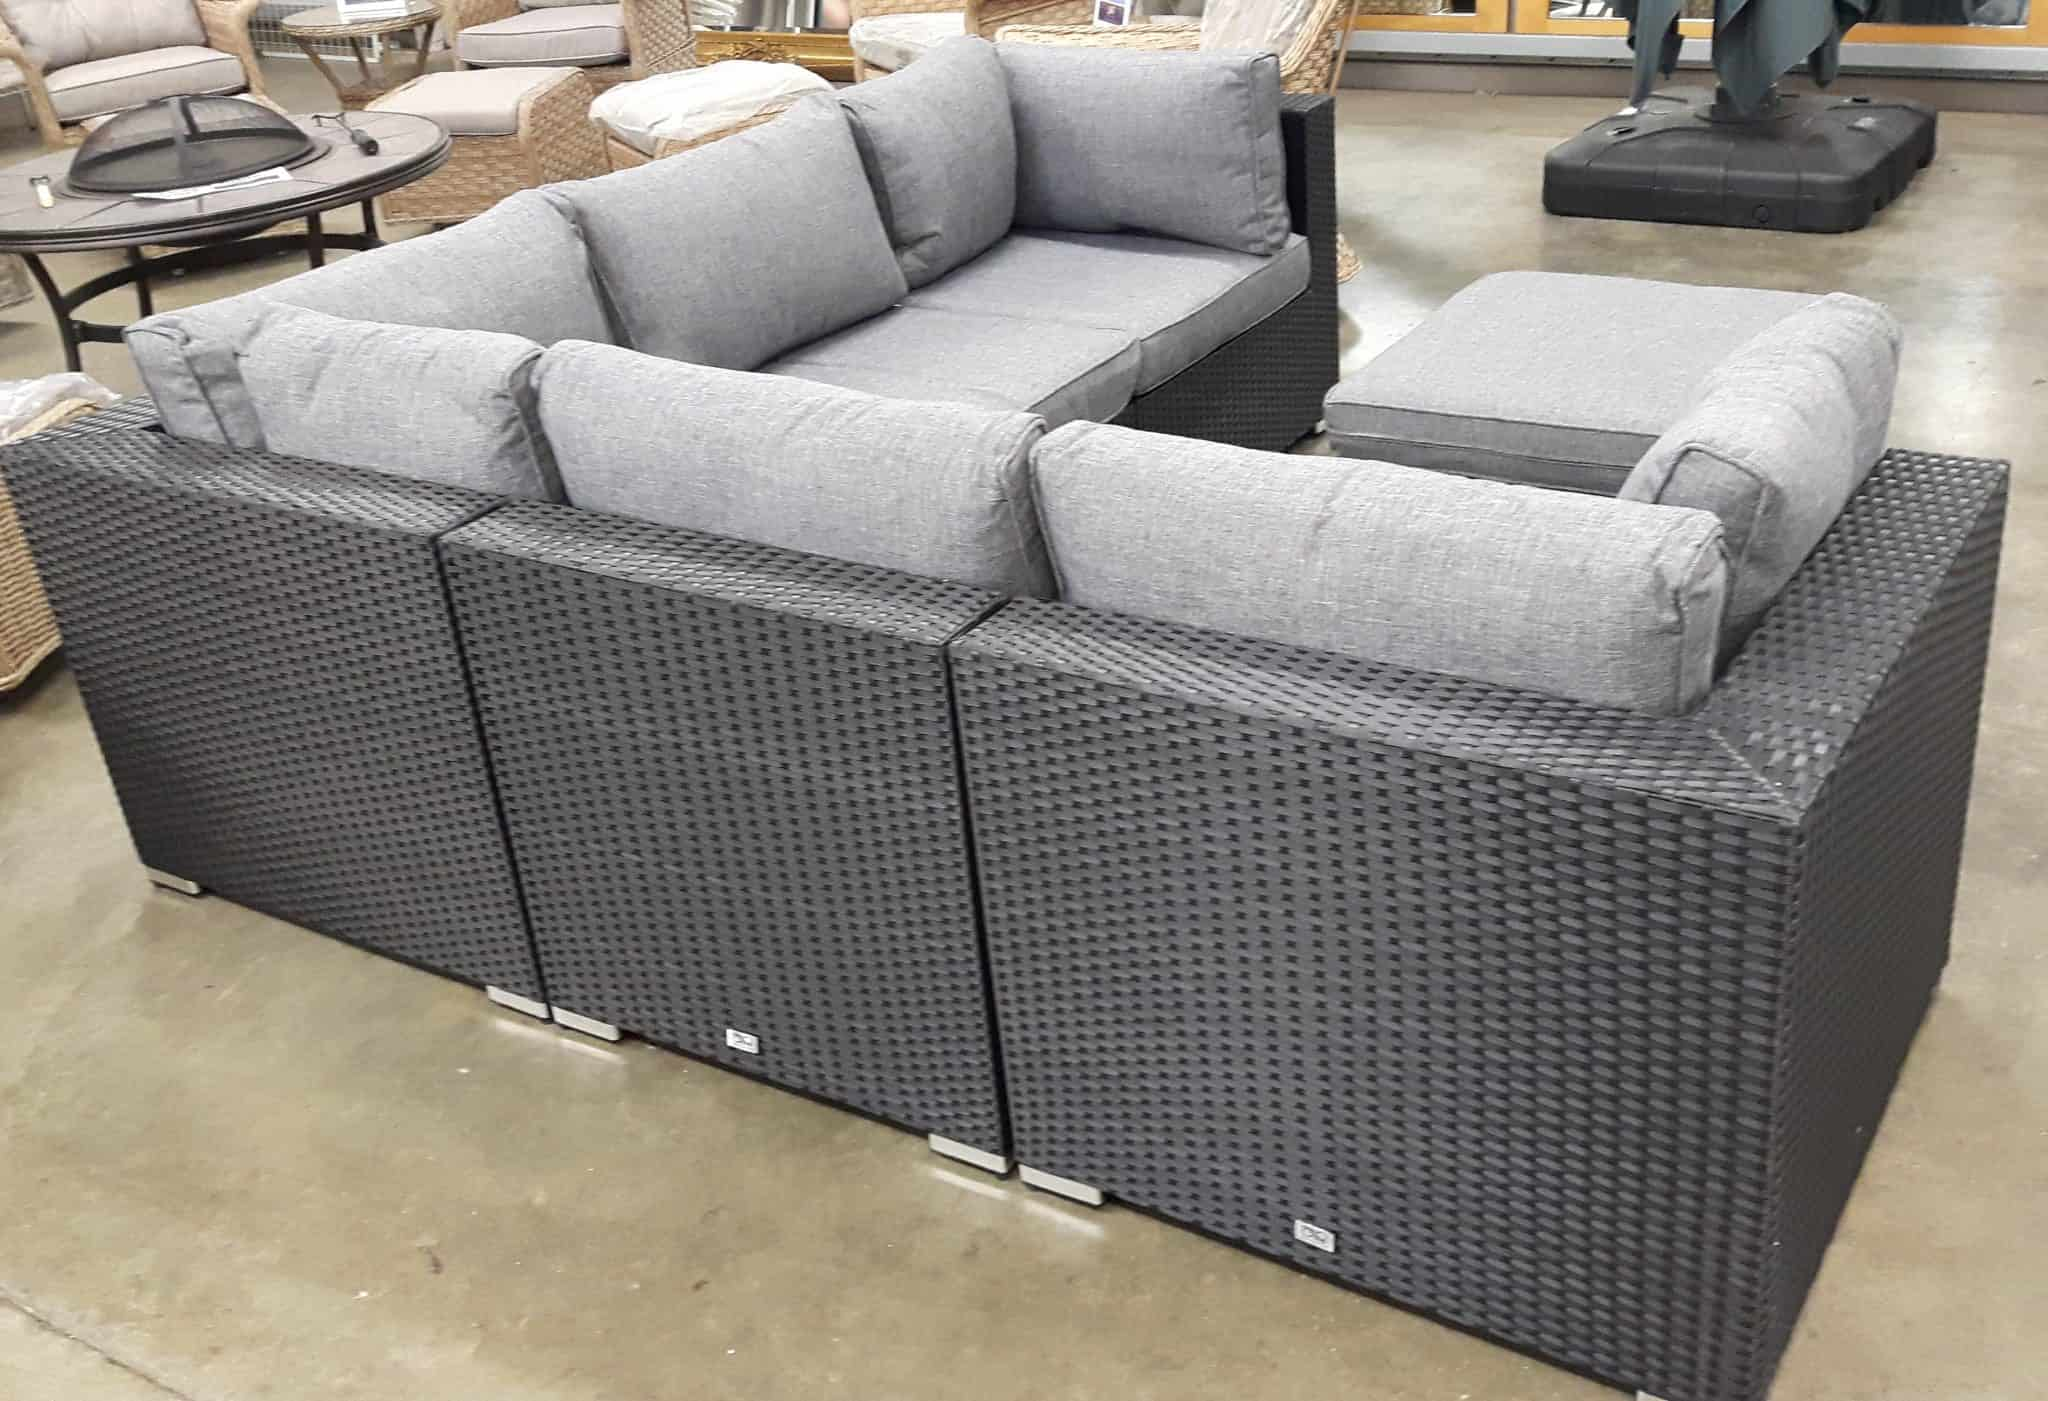 6 Piece Dorset Corner Sofa Set In Black Rattan Grey Cushions Rattanfurniture2go